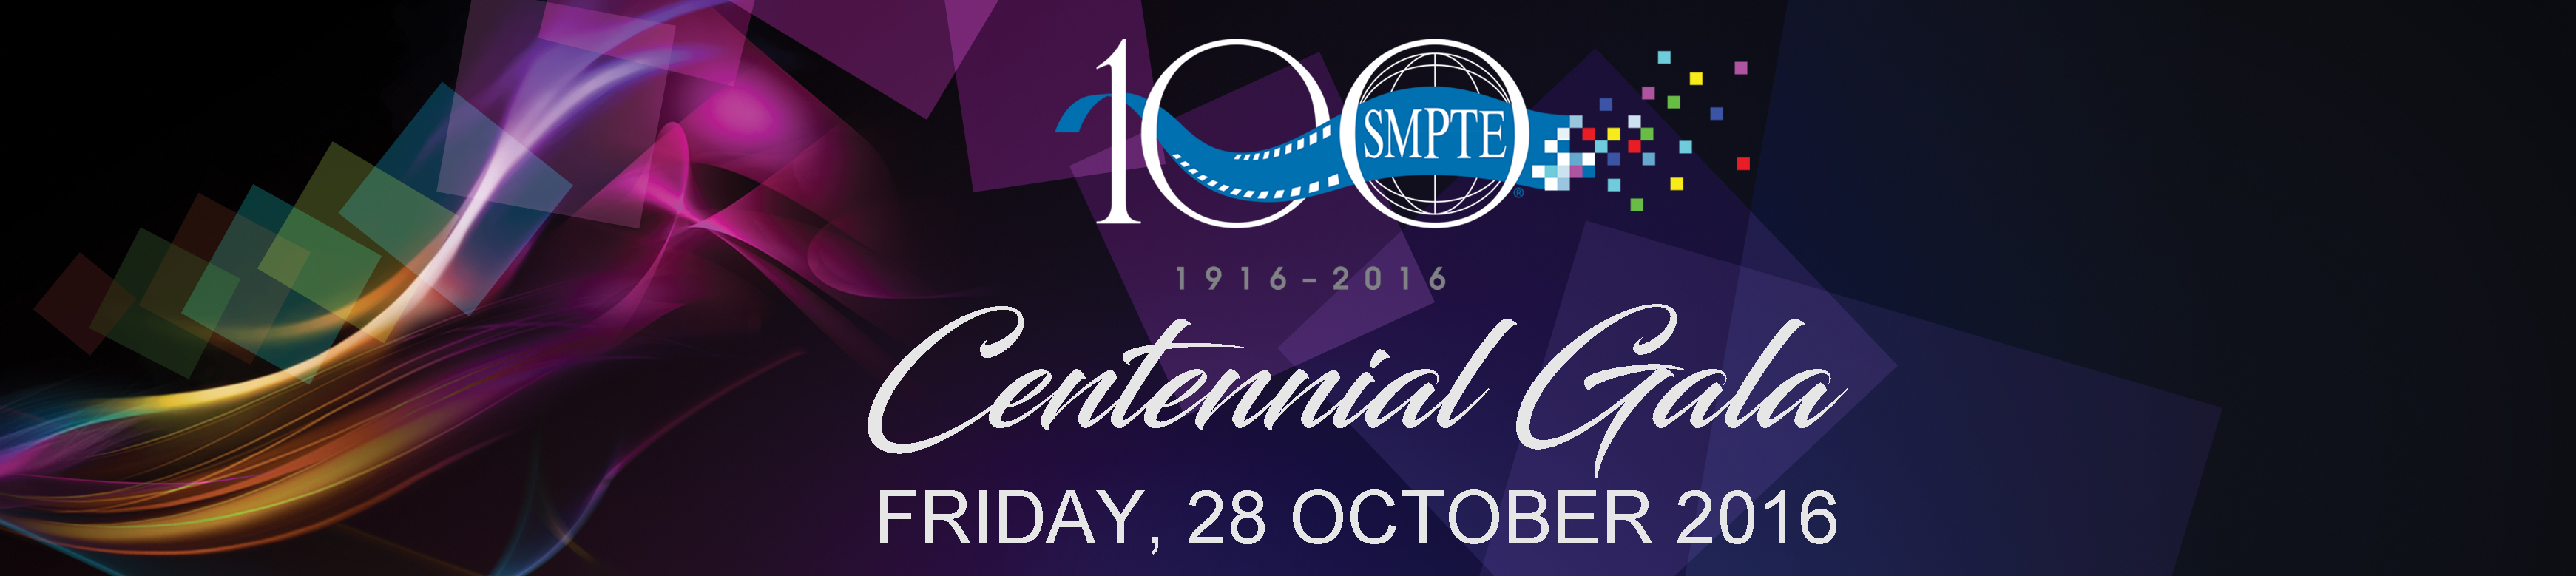 SMPTE Centennial Gala